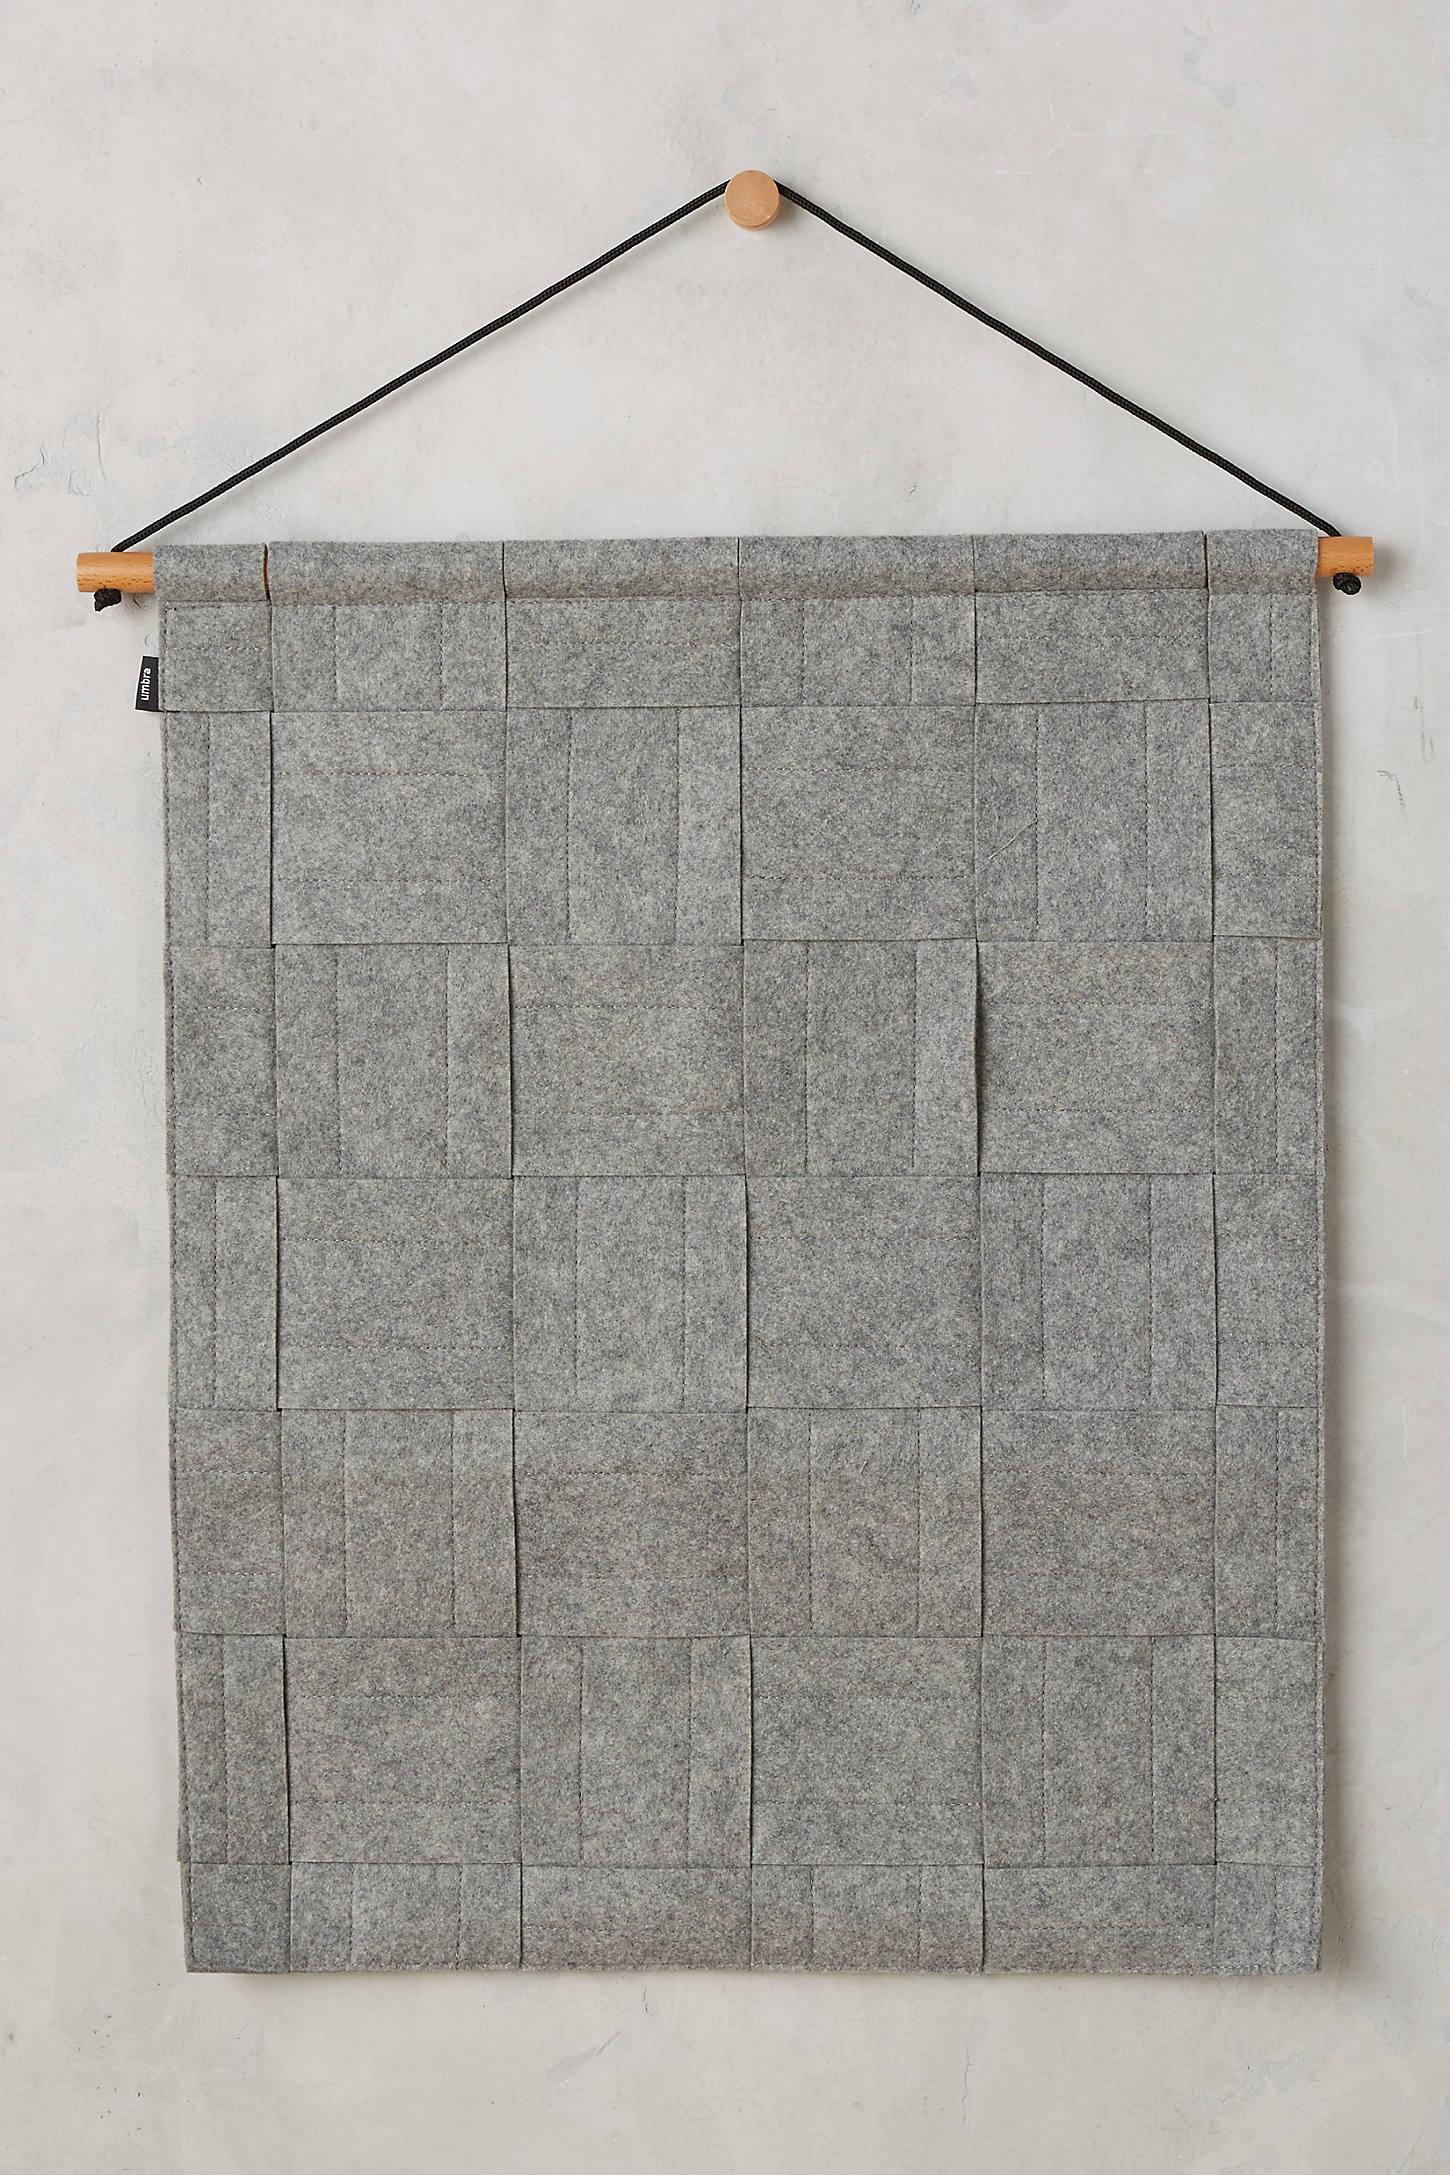 Woven Hanging Photo Display